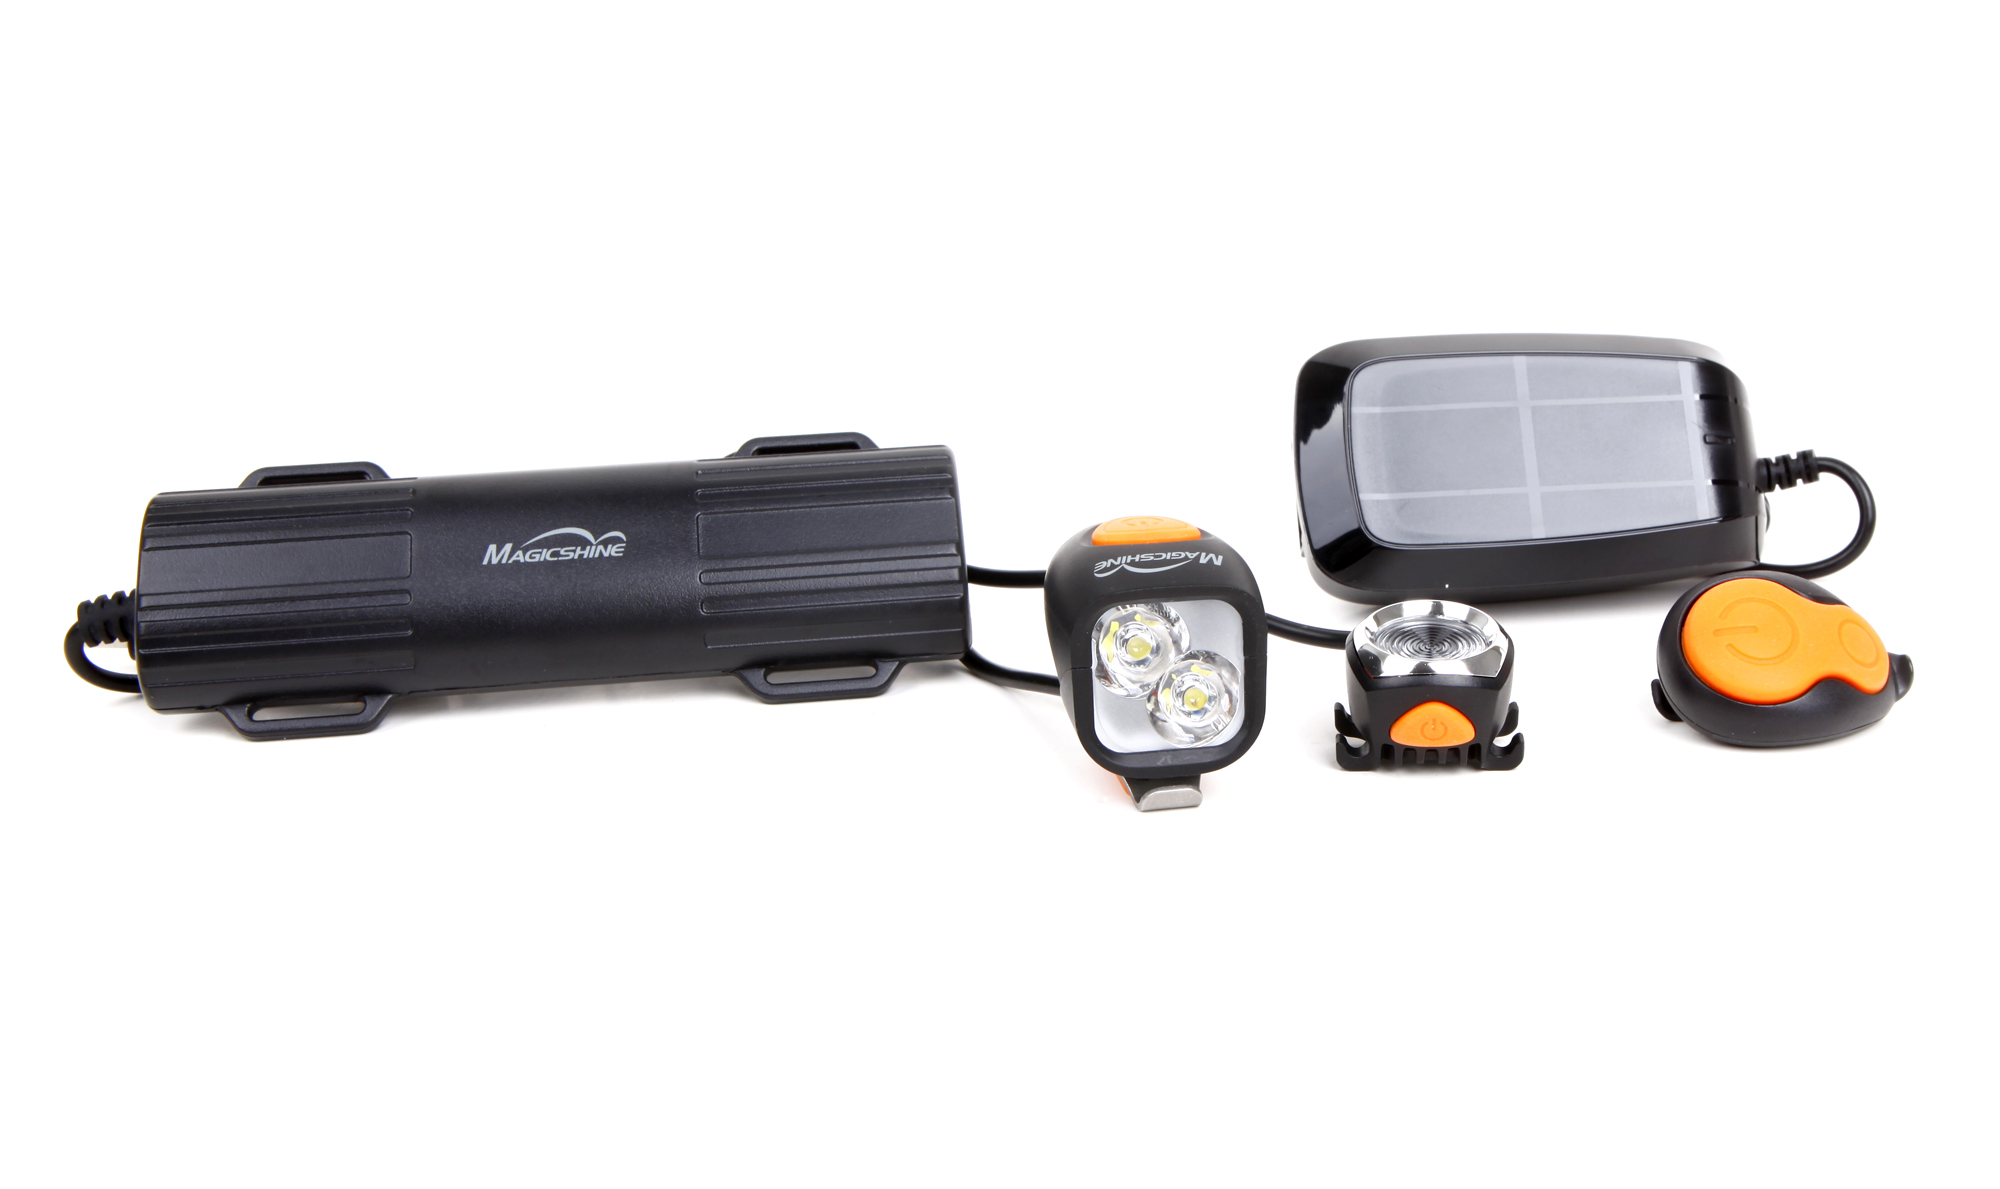 Magicshine - MJ-902 - Lygtesæt - 2000 lumen - USB opladelig | Light Set